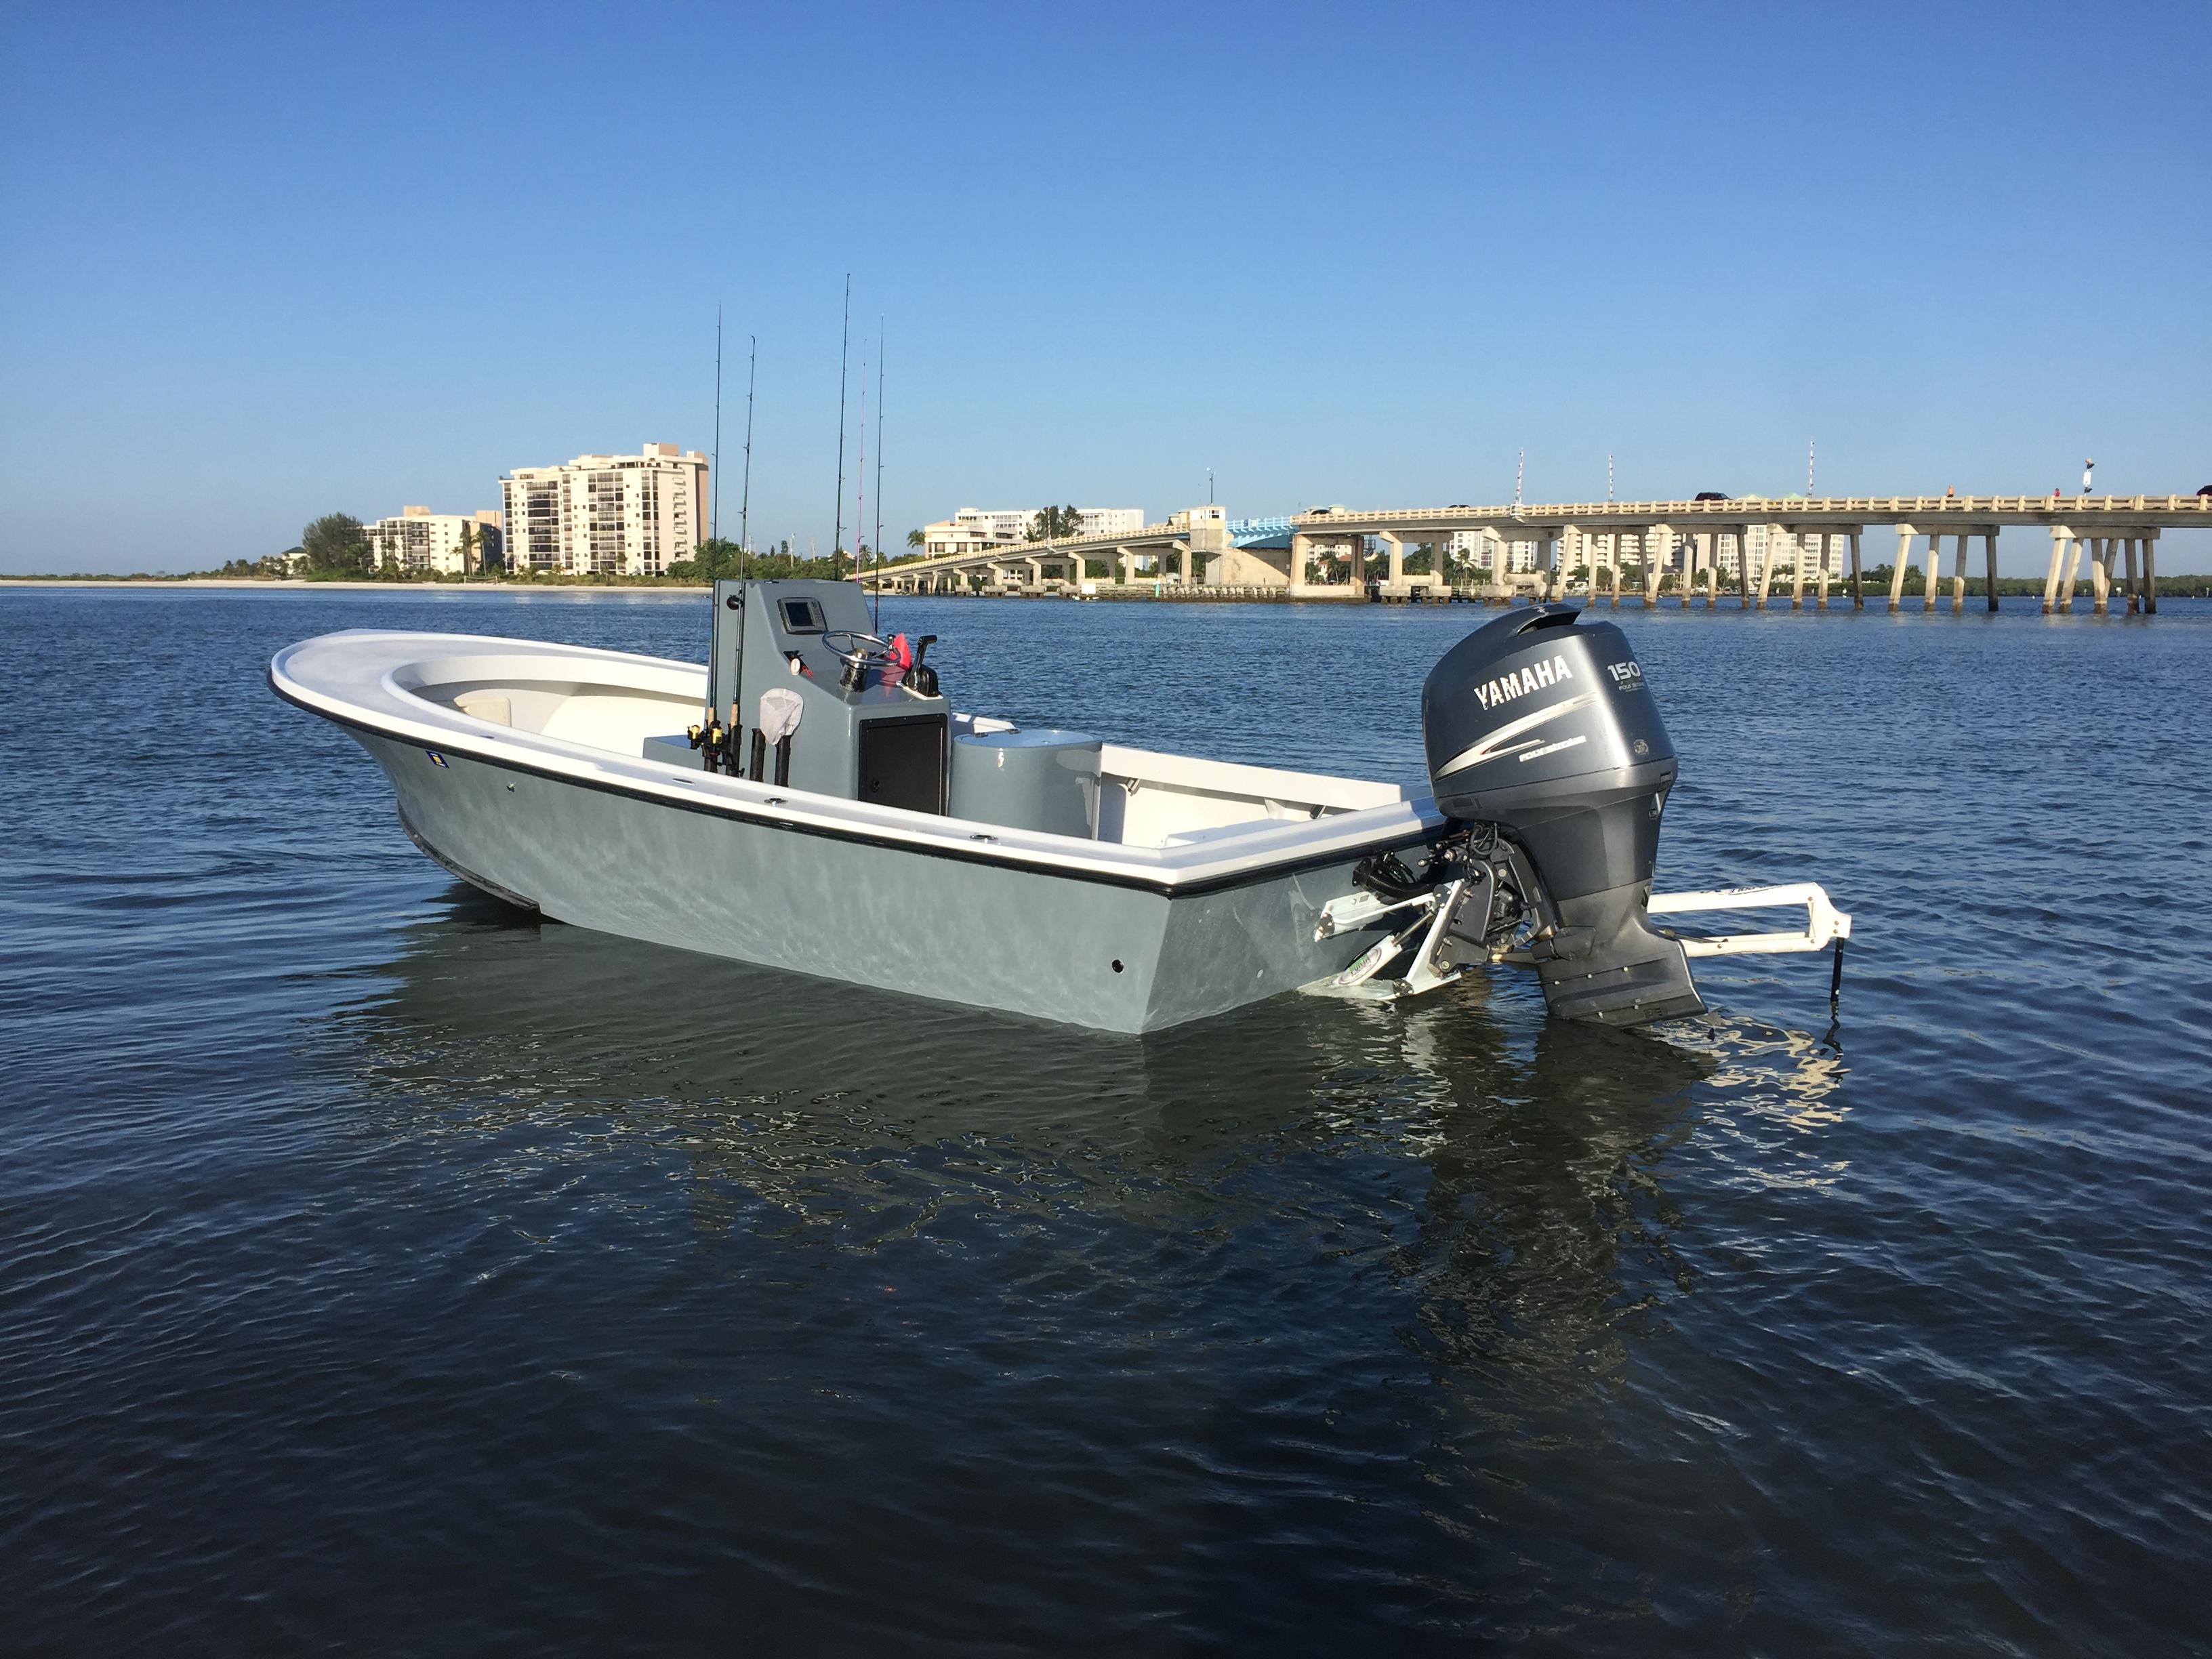 Fort myers fishing charters calusa fishing adventures for Bonita springs fishing charters